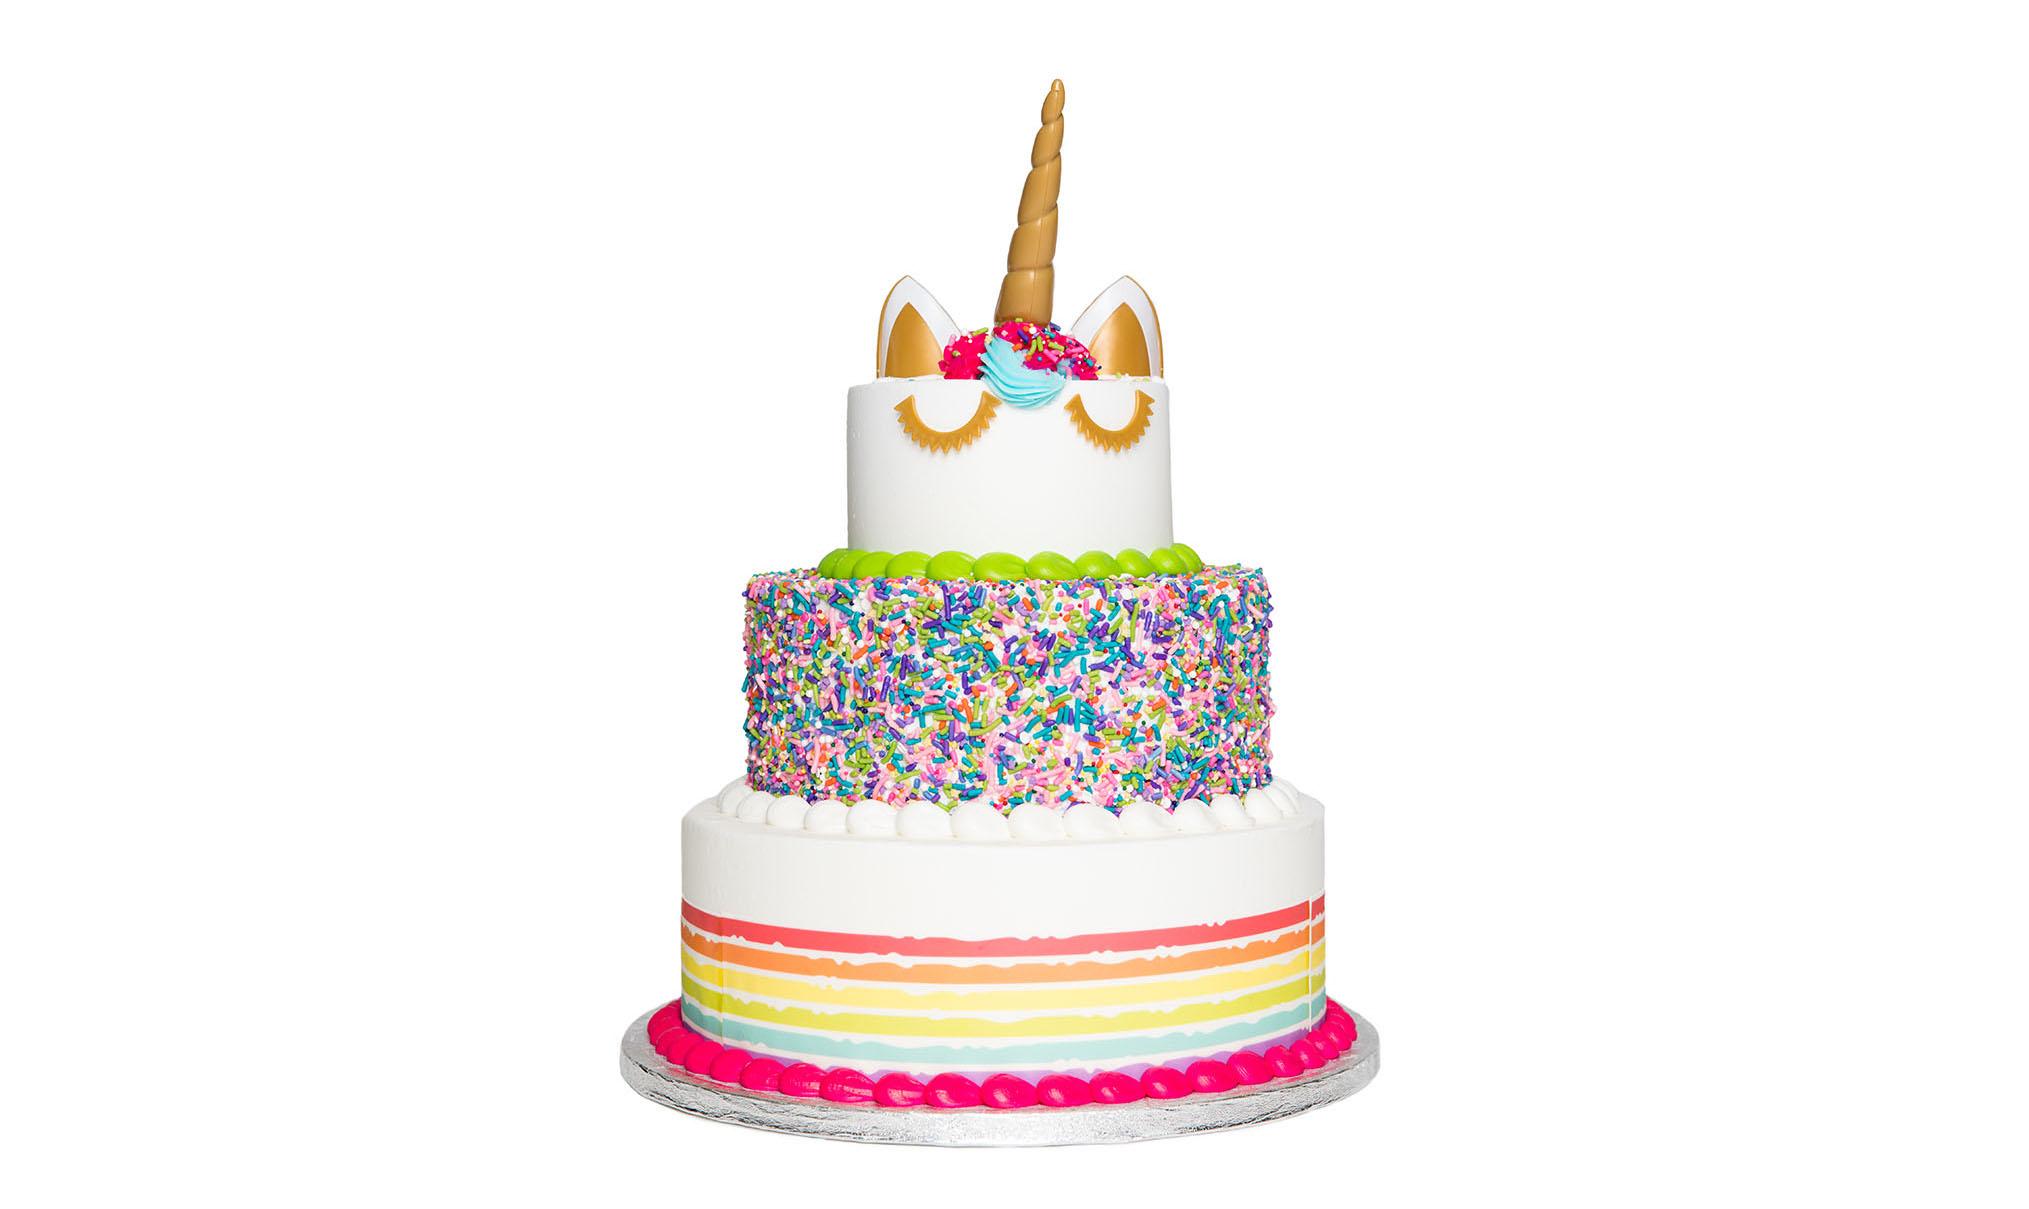 Sams Club Stacks A Rainbow Cake For National Unicorn Day Gk